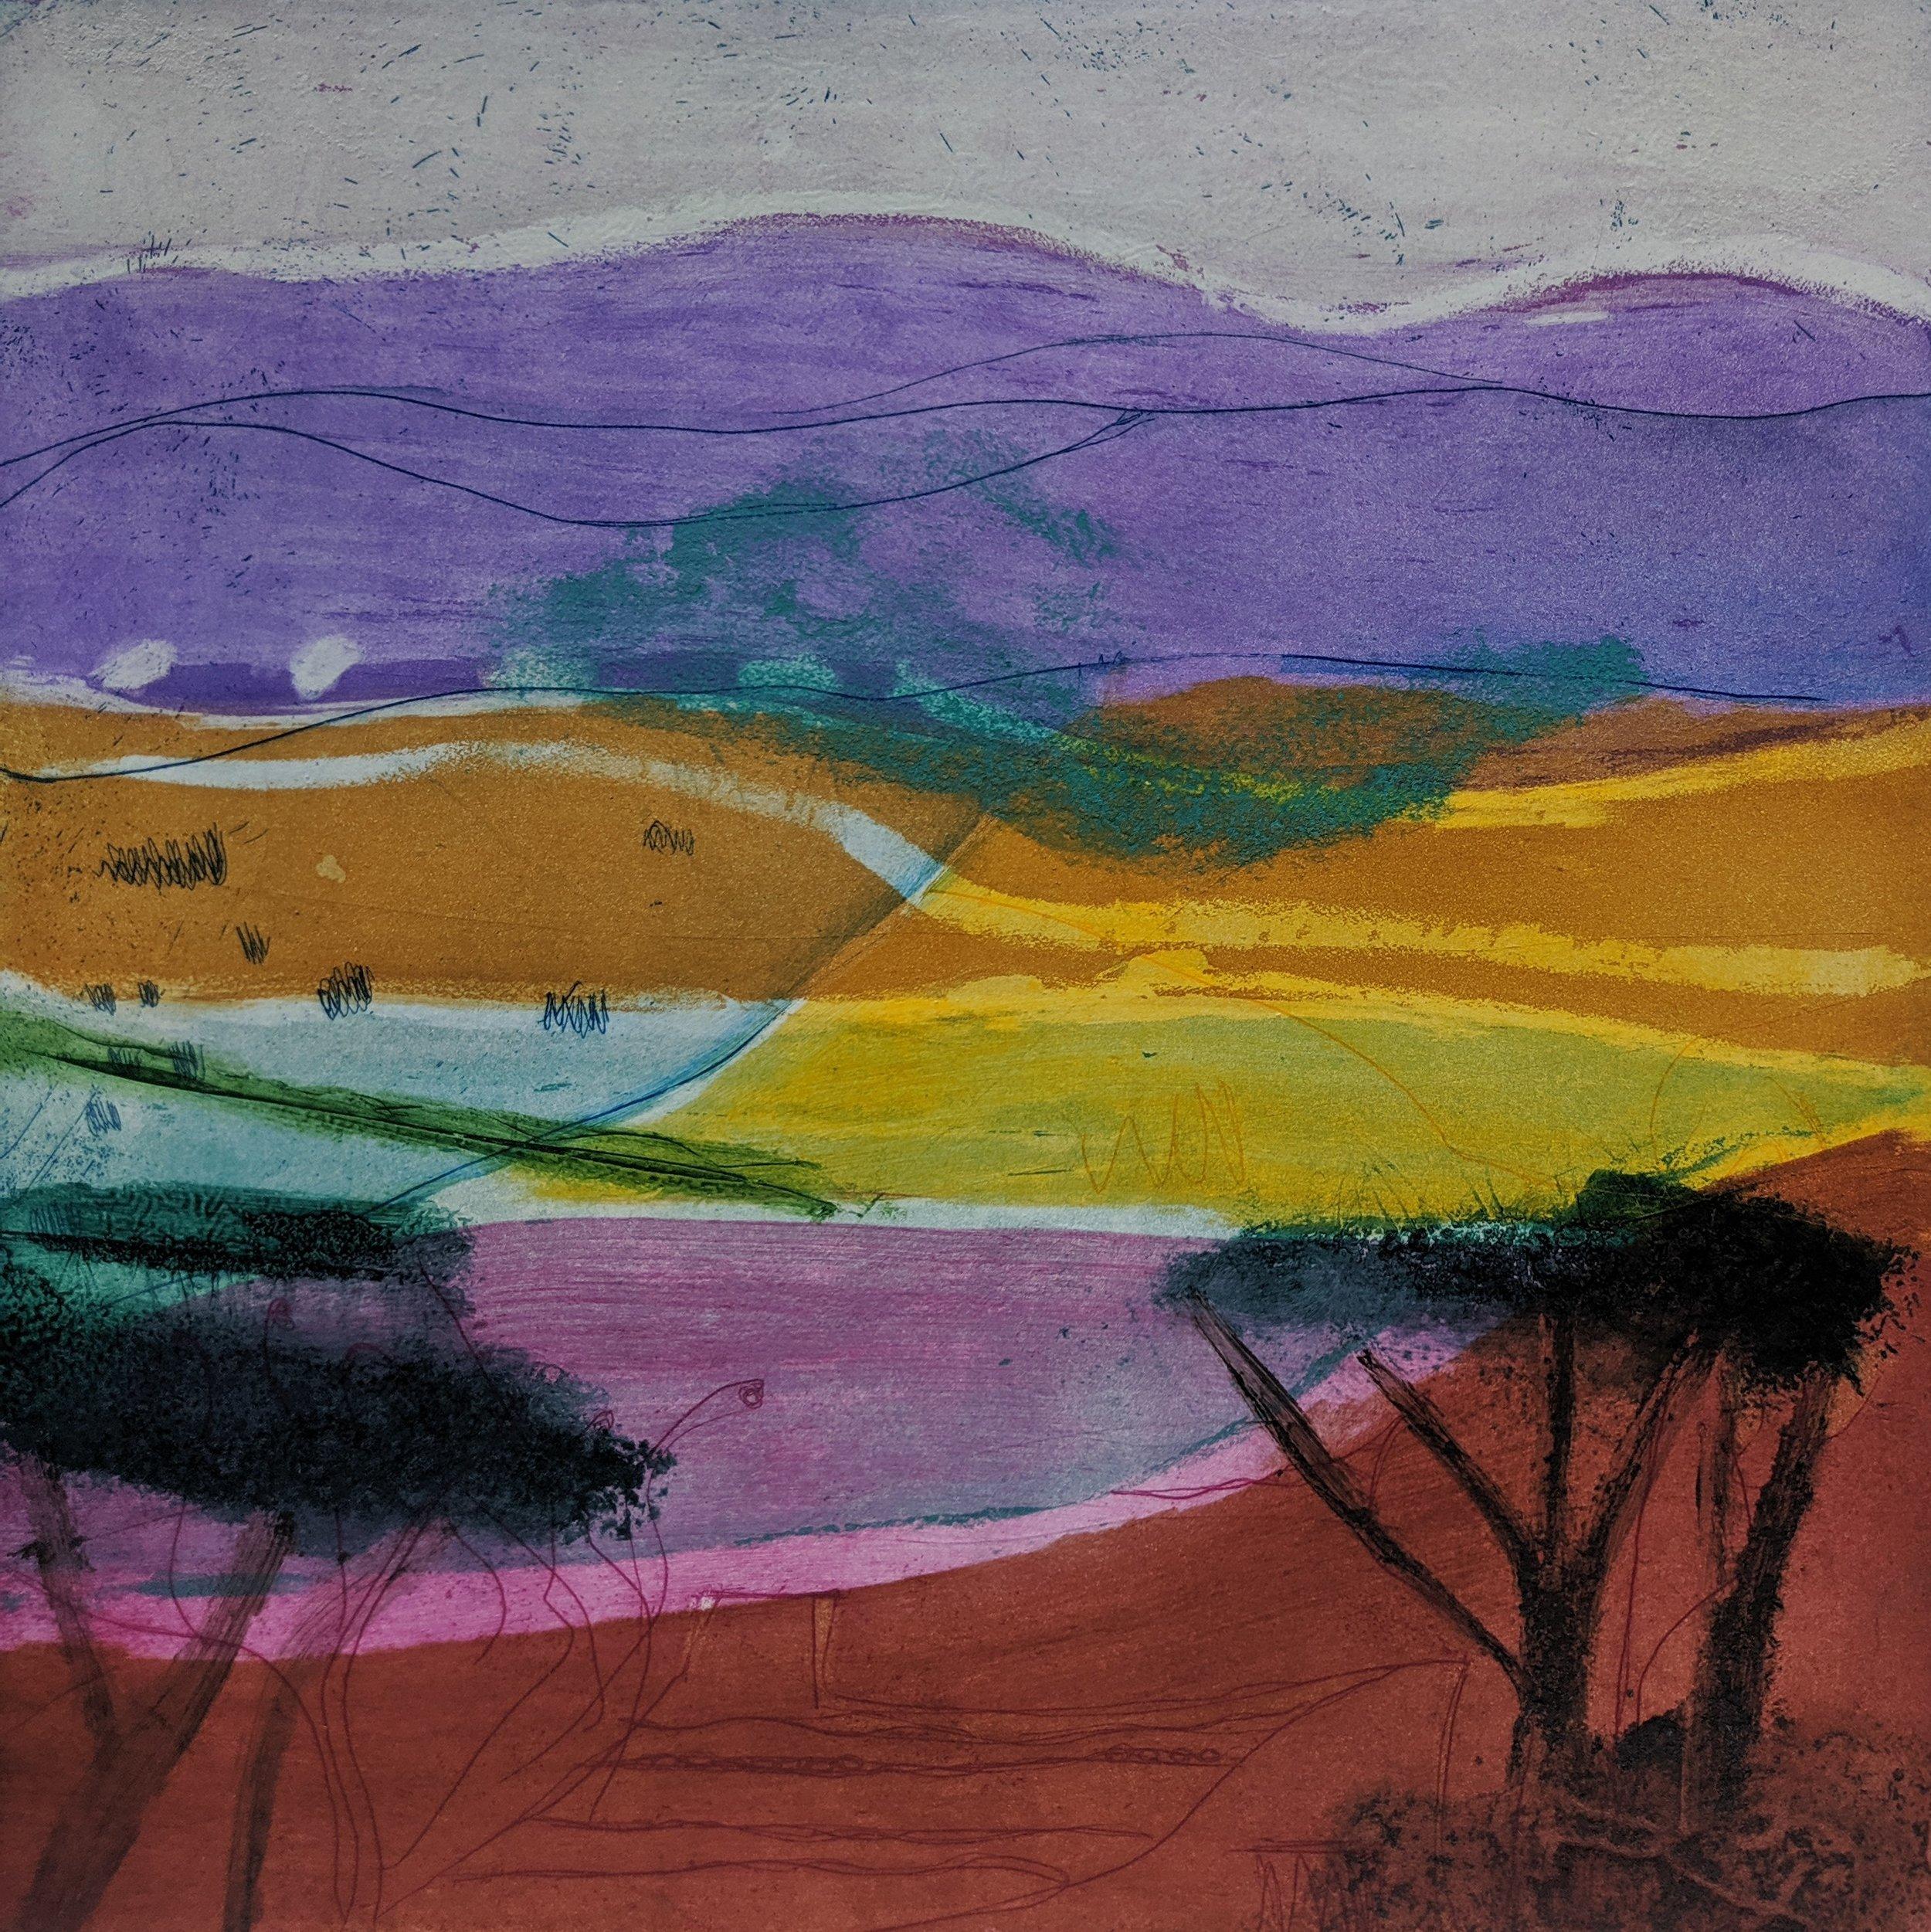 Artist: Louise Davies  Title: Summer Haze  Size: 33 x 33 cm  Medium: Etching  Price: £350